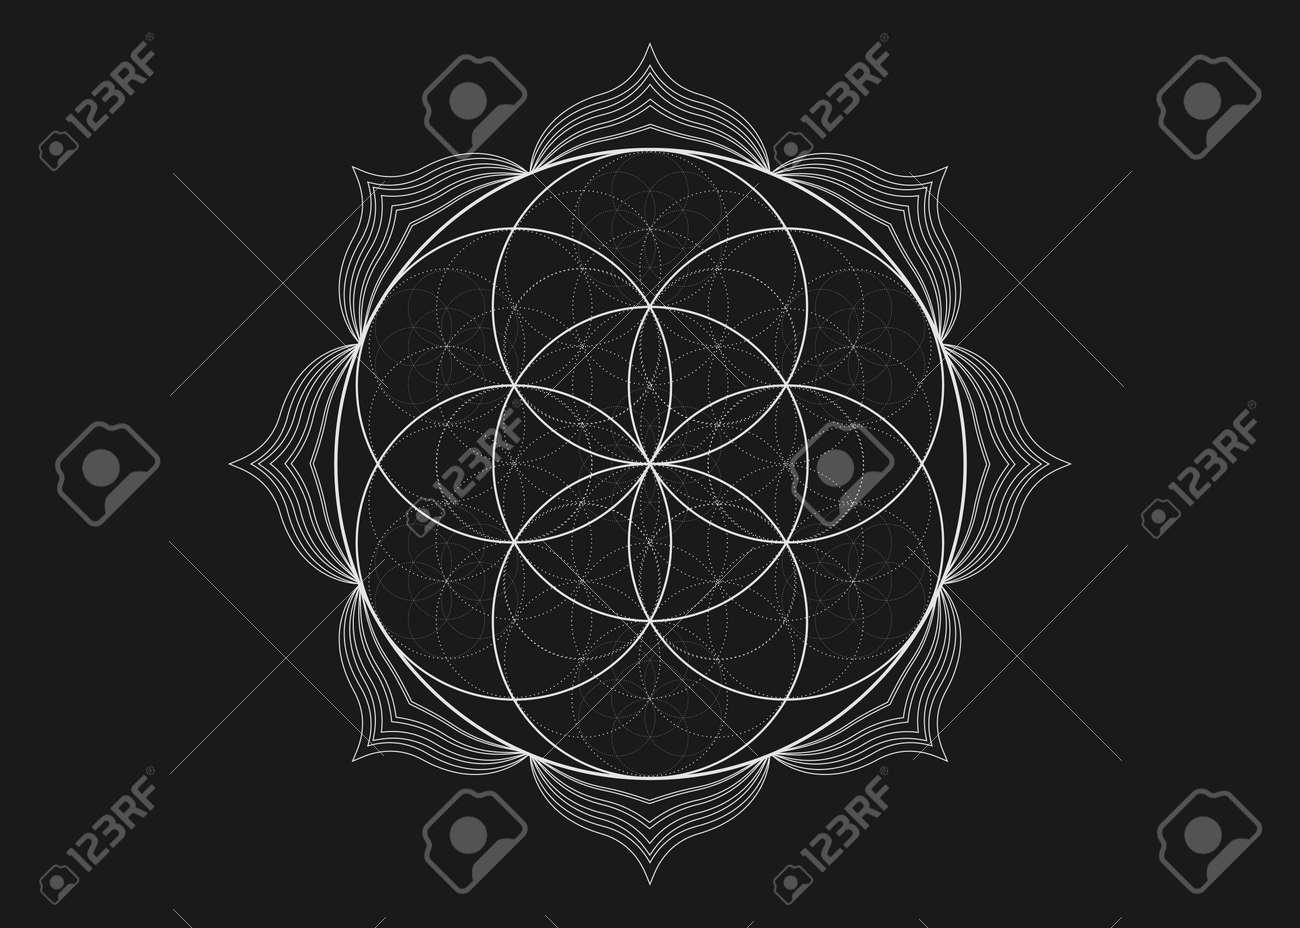 Seed Flower of life lotus icon, yantra mandala sacred geometry, tattoo symbol of harmony and balance. Mystical talisman, white lines vector isolated on black background - 173019814